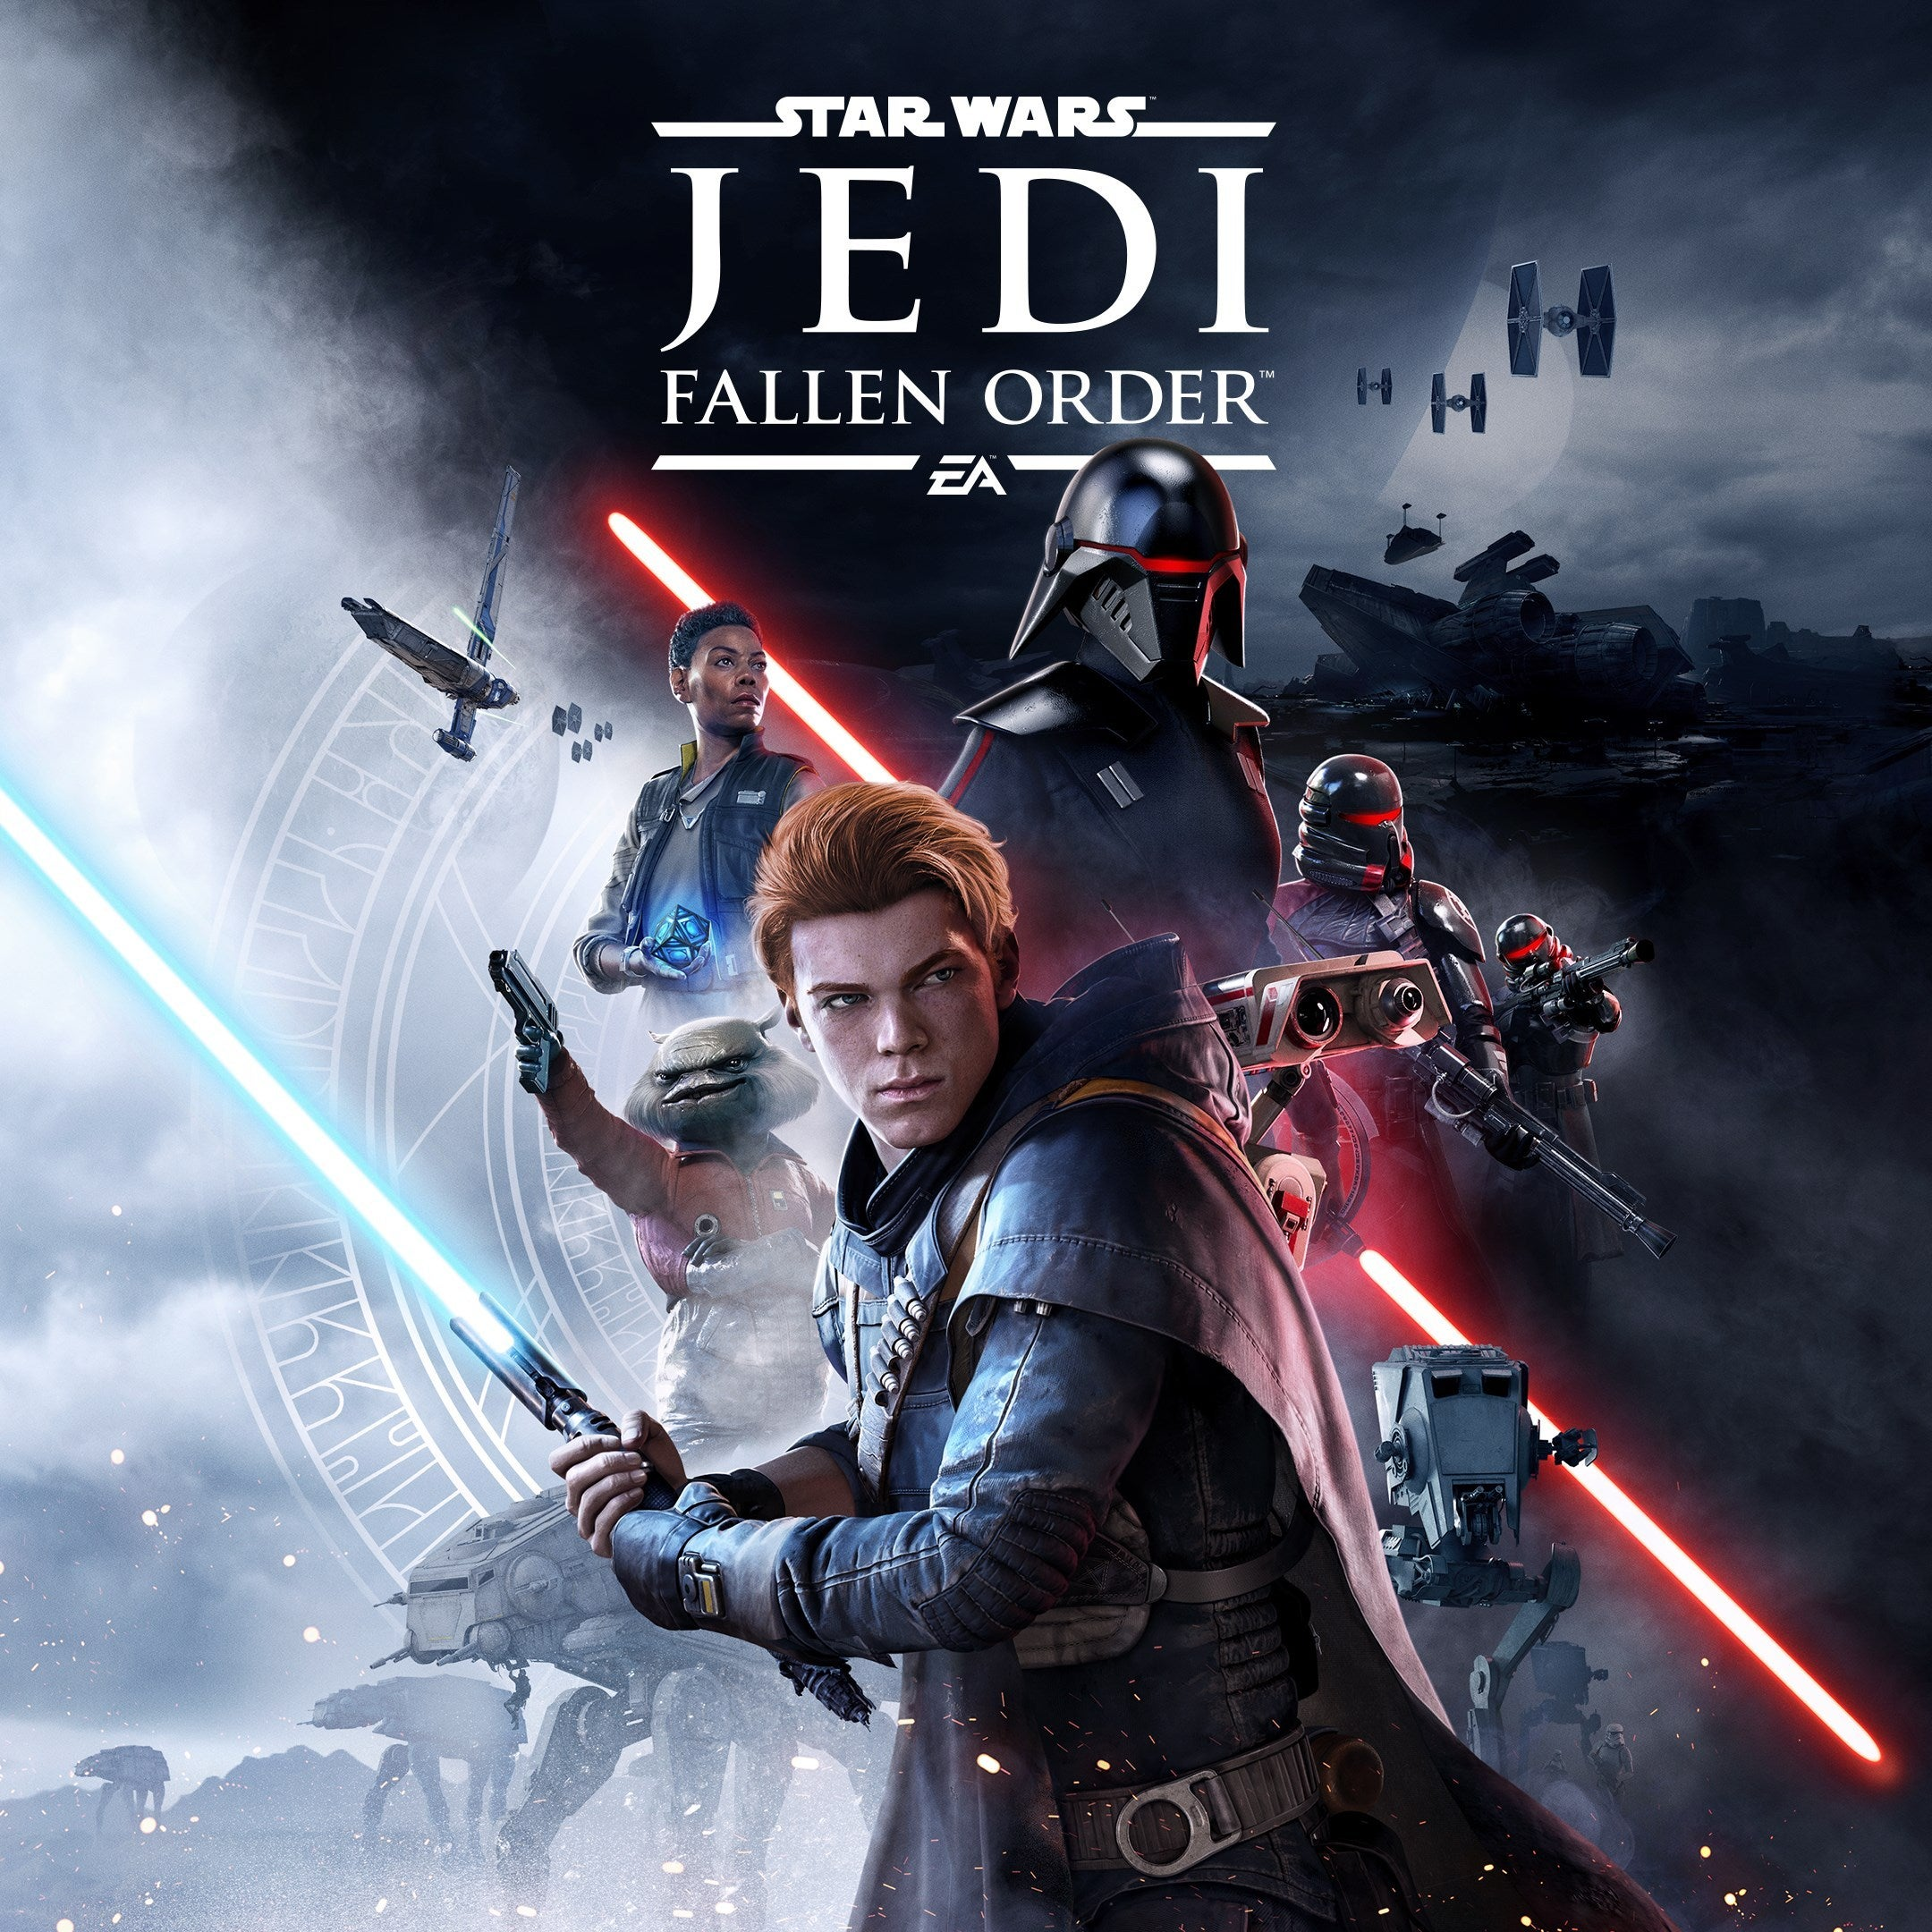 star-wars-jedi-fallen-order---button-fin-2-1573507204864